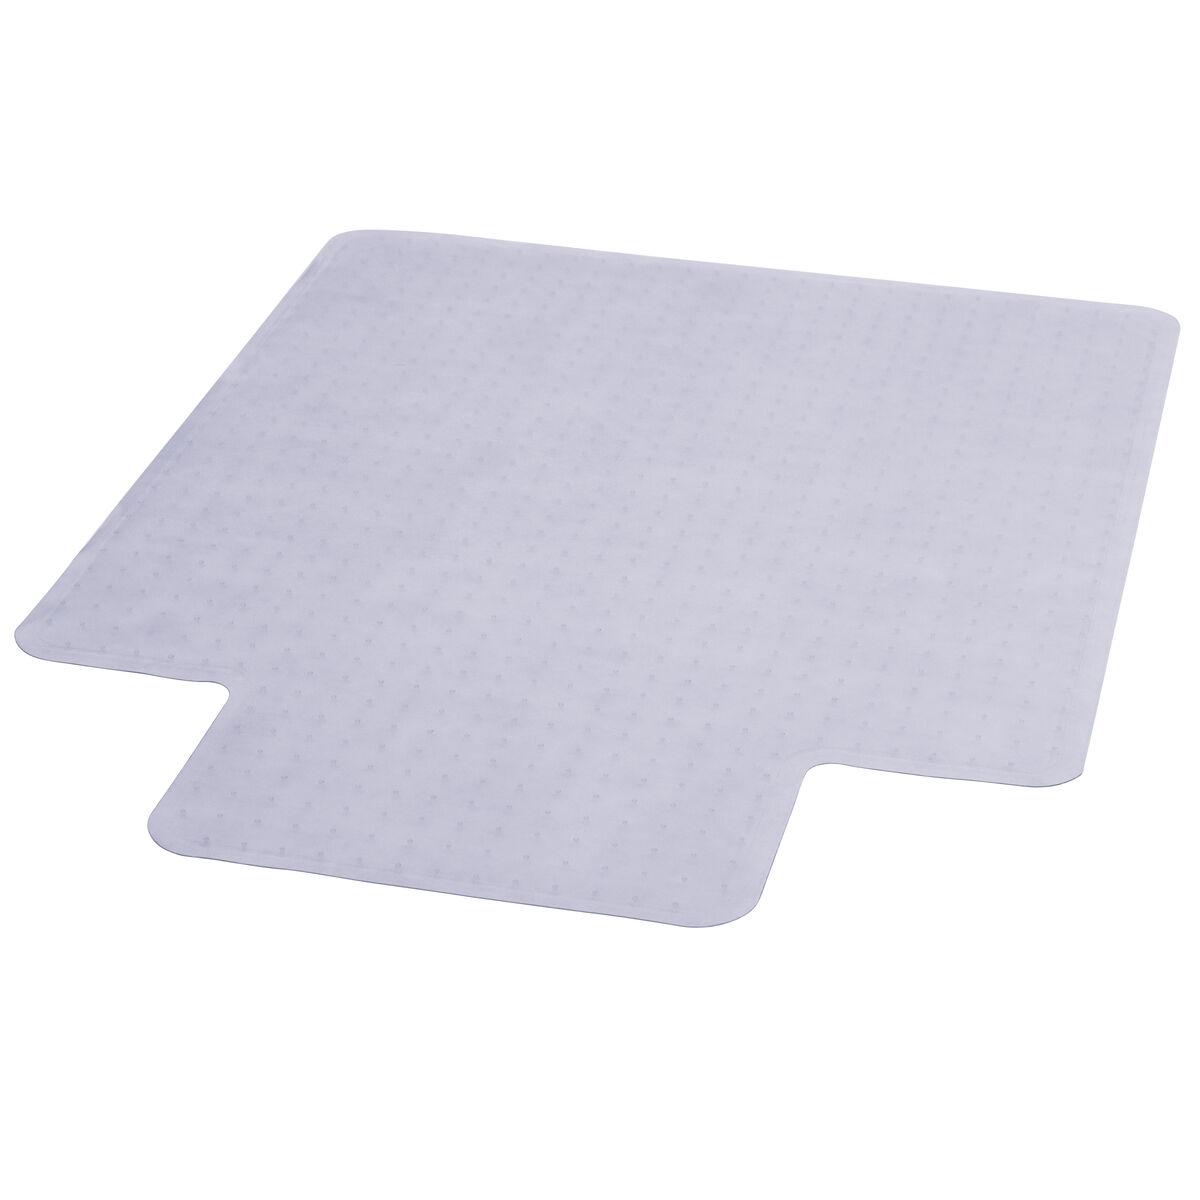 36x48 clear chair mat lip mat cm11113fd gg churchchairs4less com